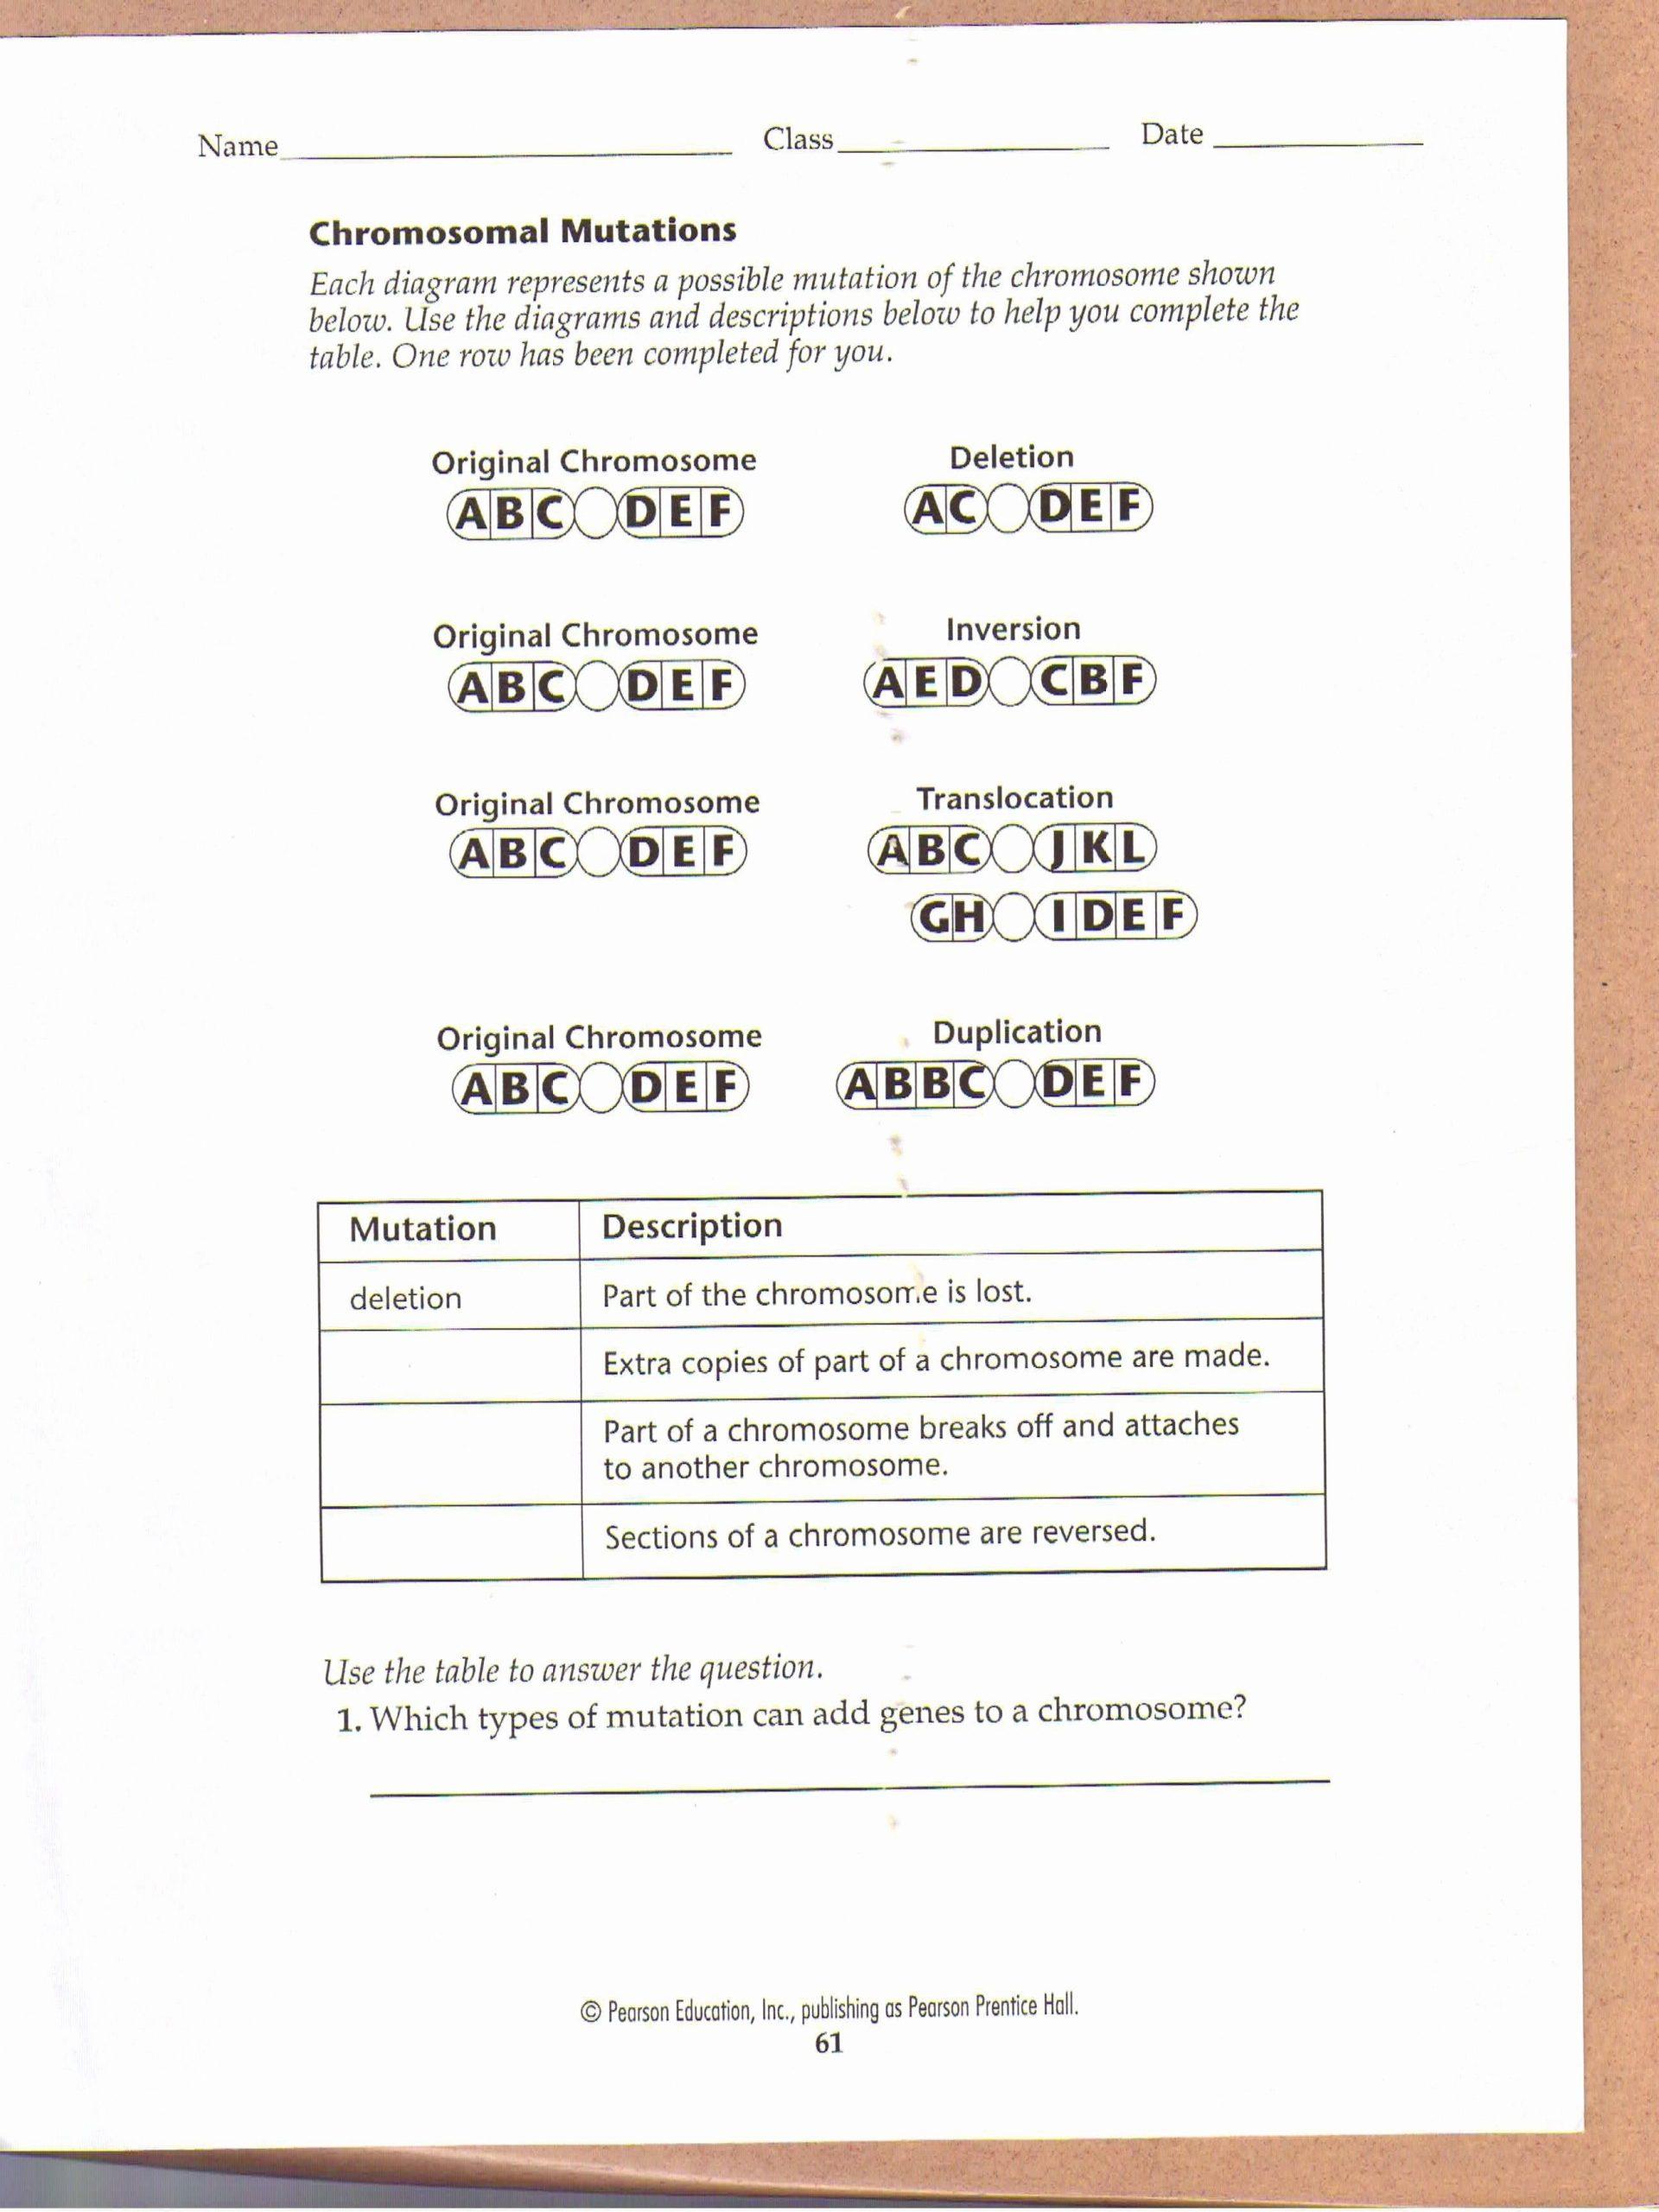 Genetic Mutation Worksheet Answer Key Genetic Mutation Worksheet Answer Key Inspirational